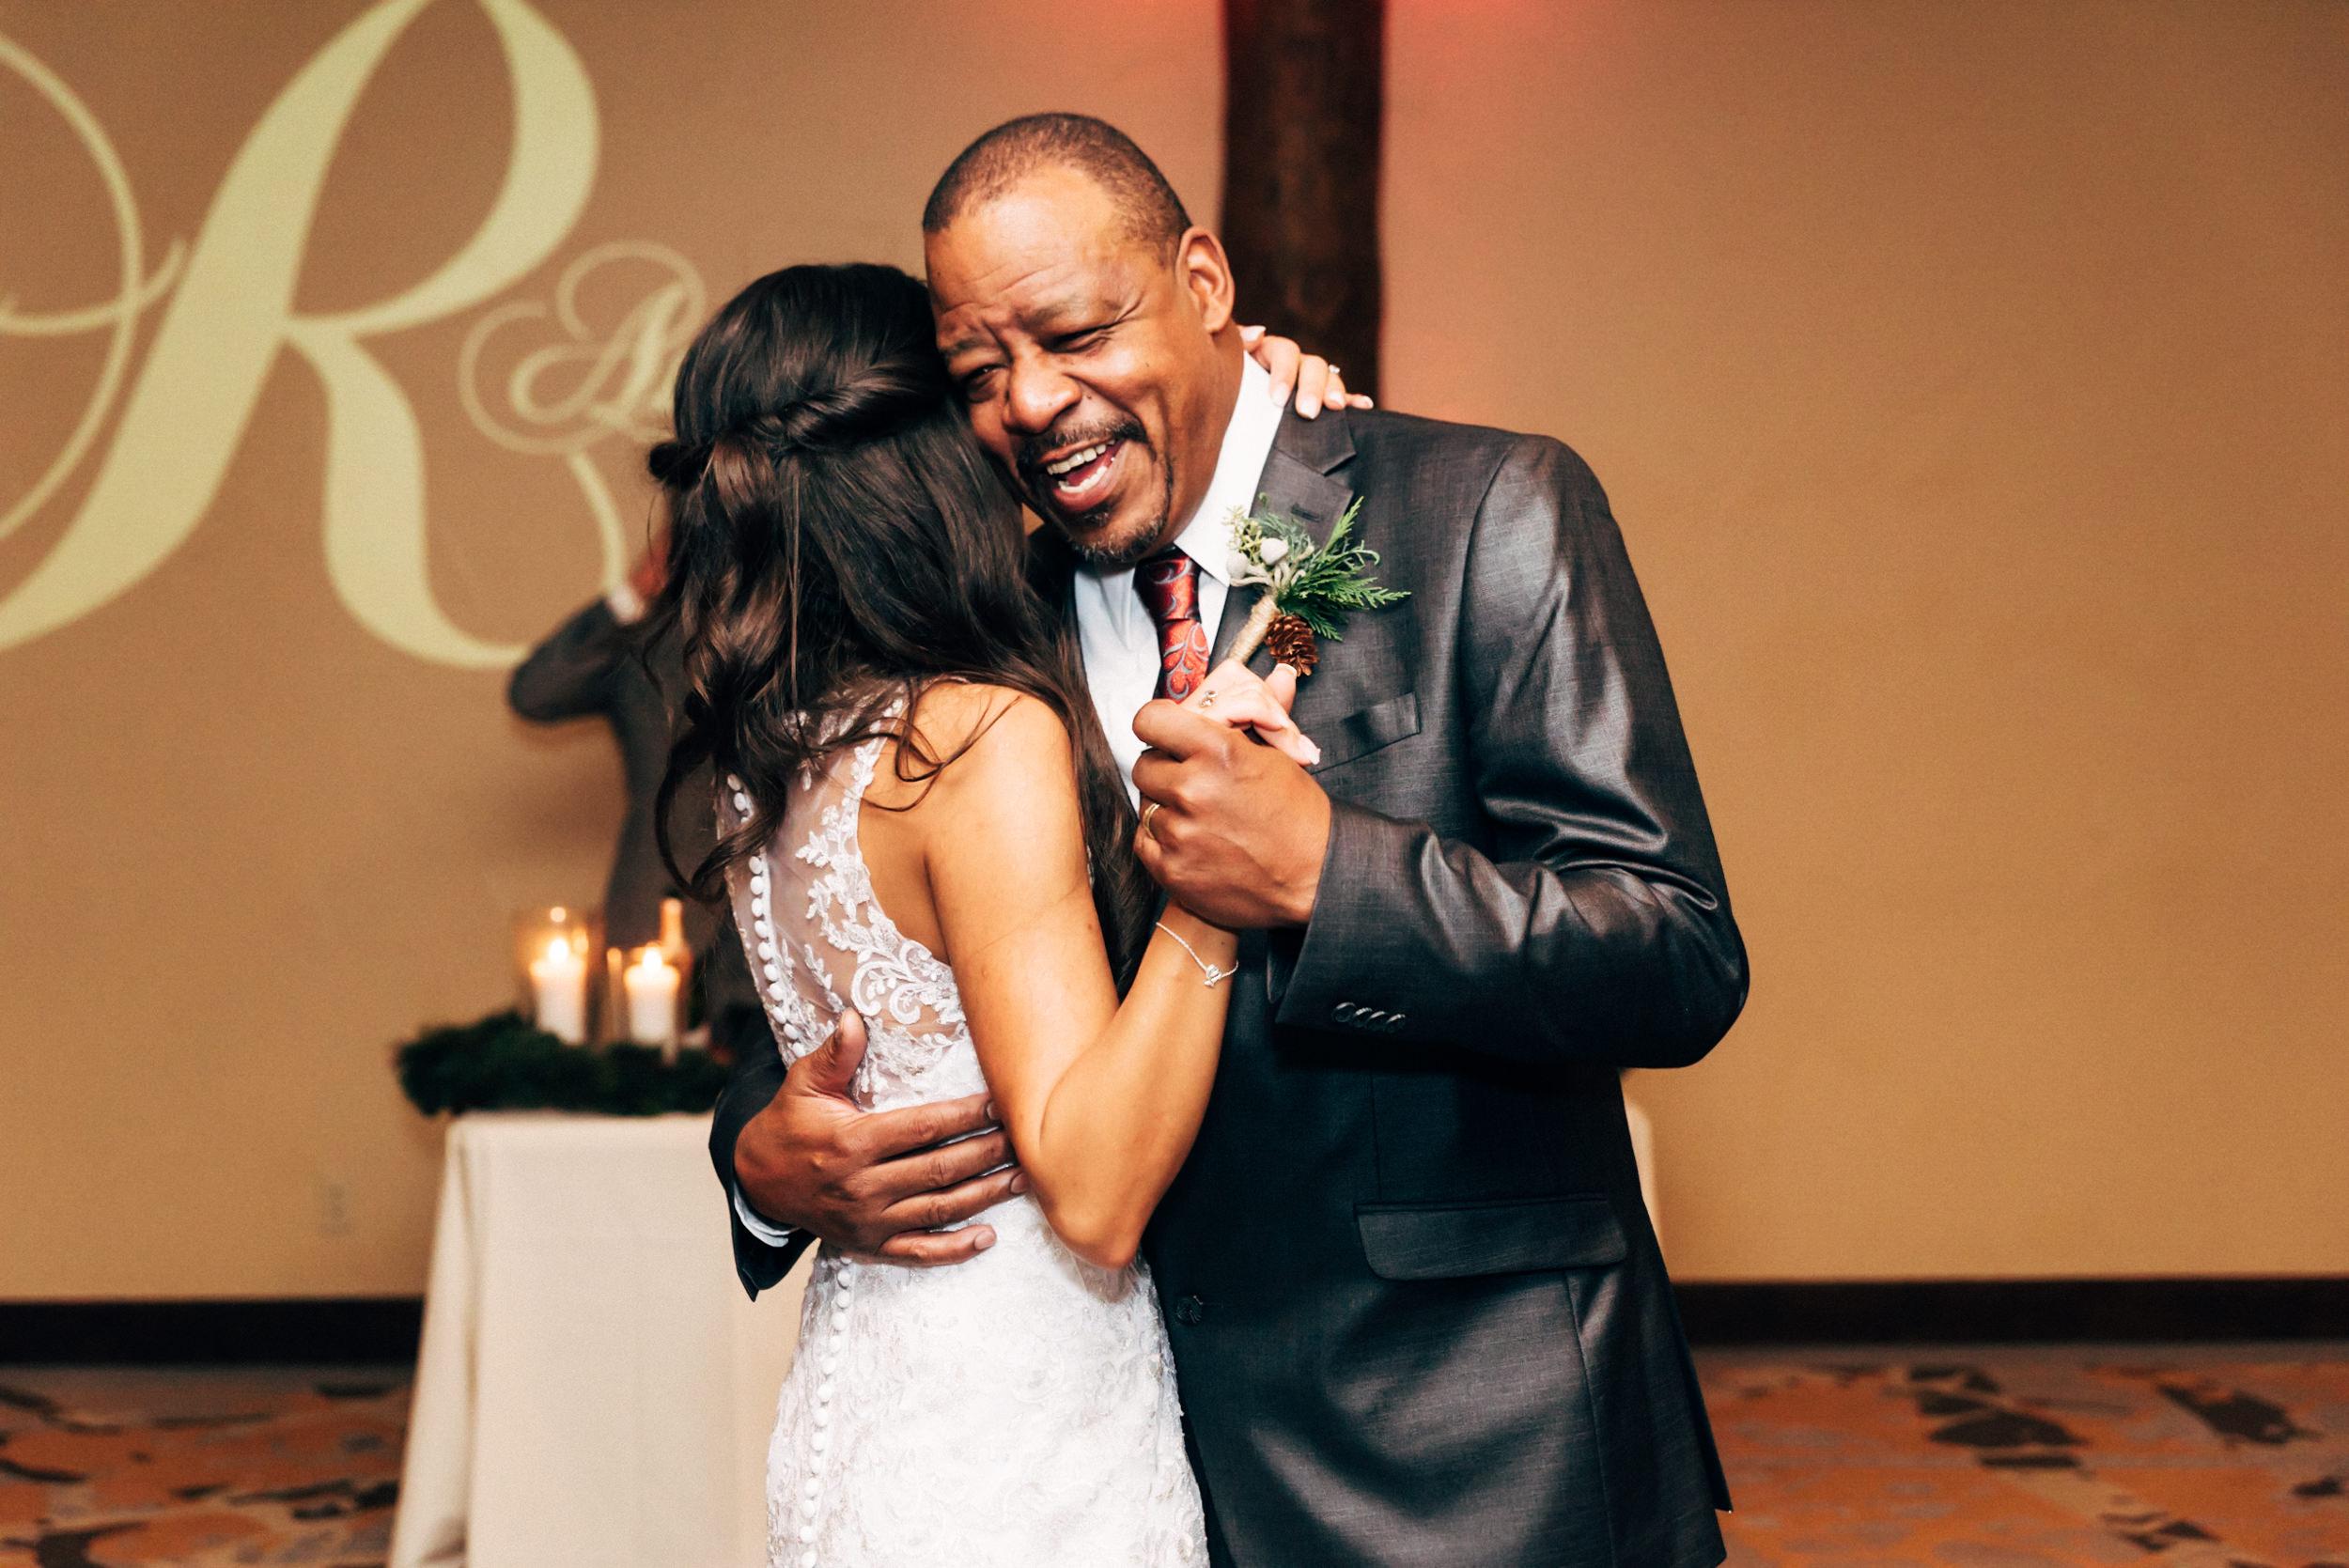 Colorado-Wedding-Photographer-Breckinridge-Mountain-Adventure-Elopement-74.jpg